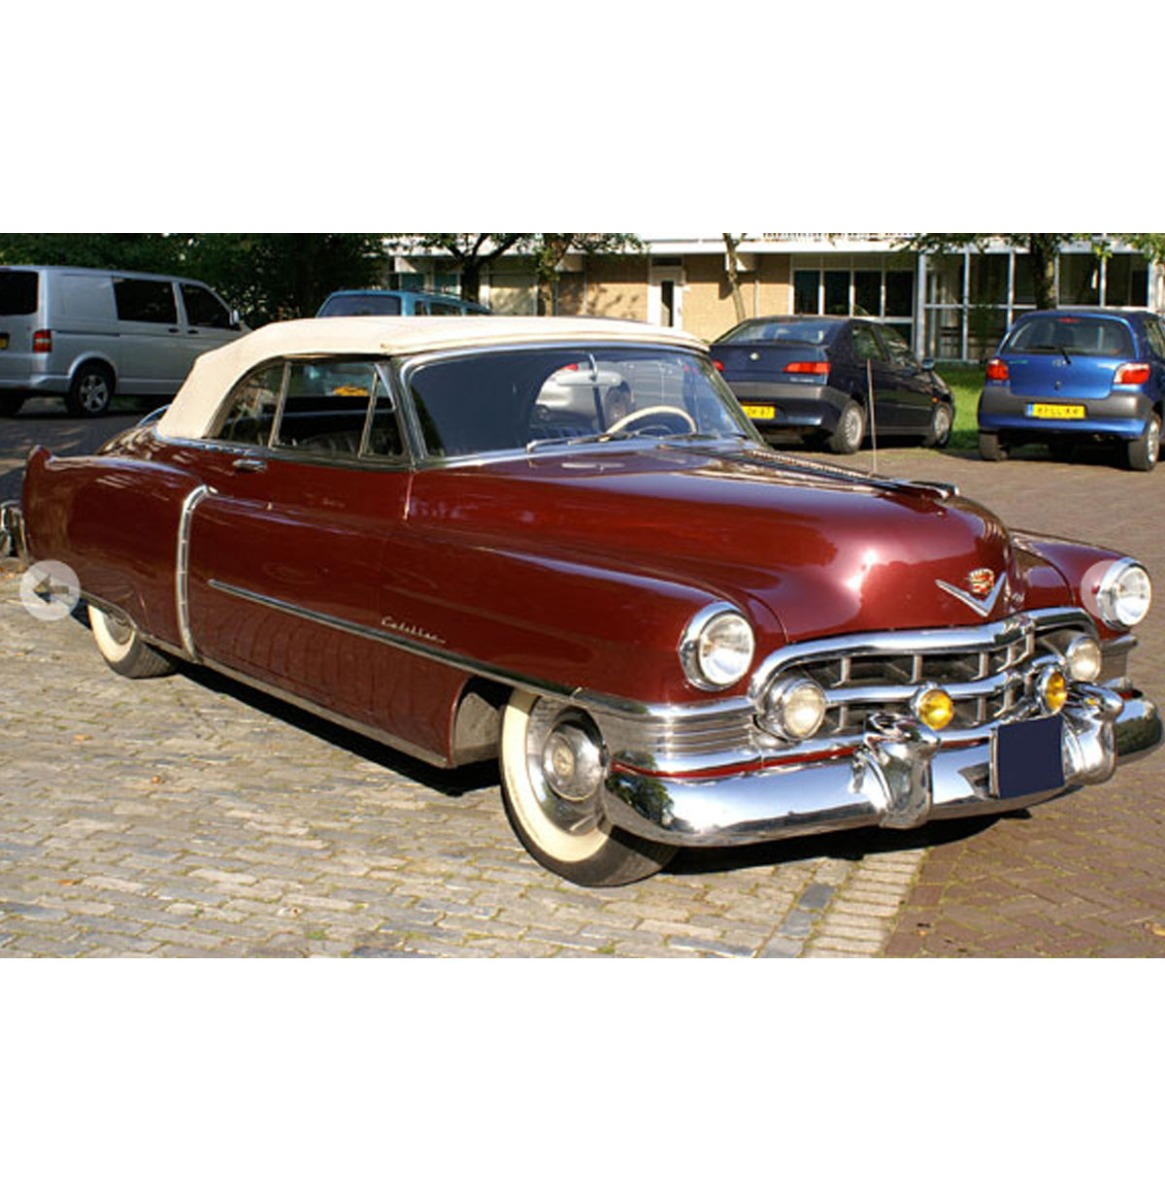 Cadillac Eldorado 8.2 Convertible 1950 - Bordeaux Rood